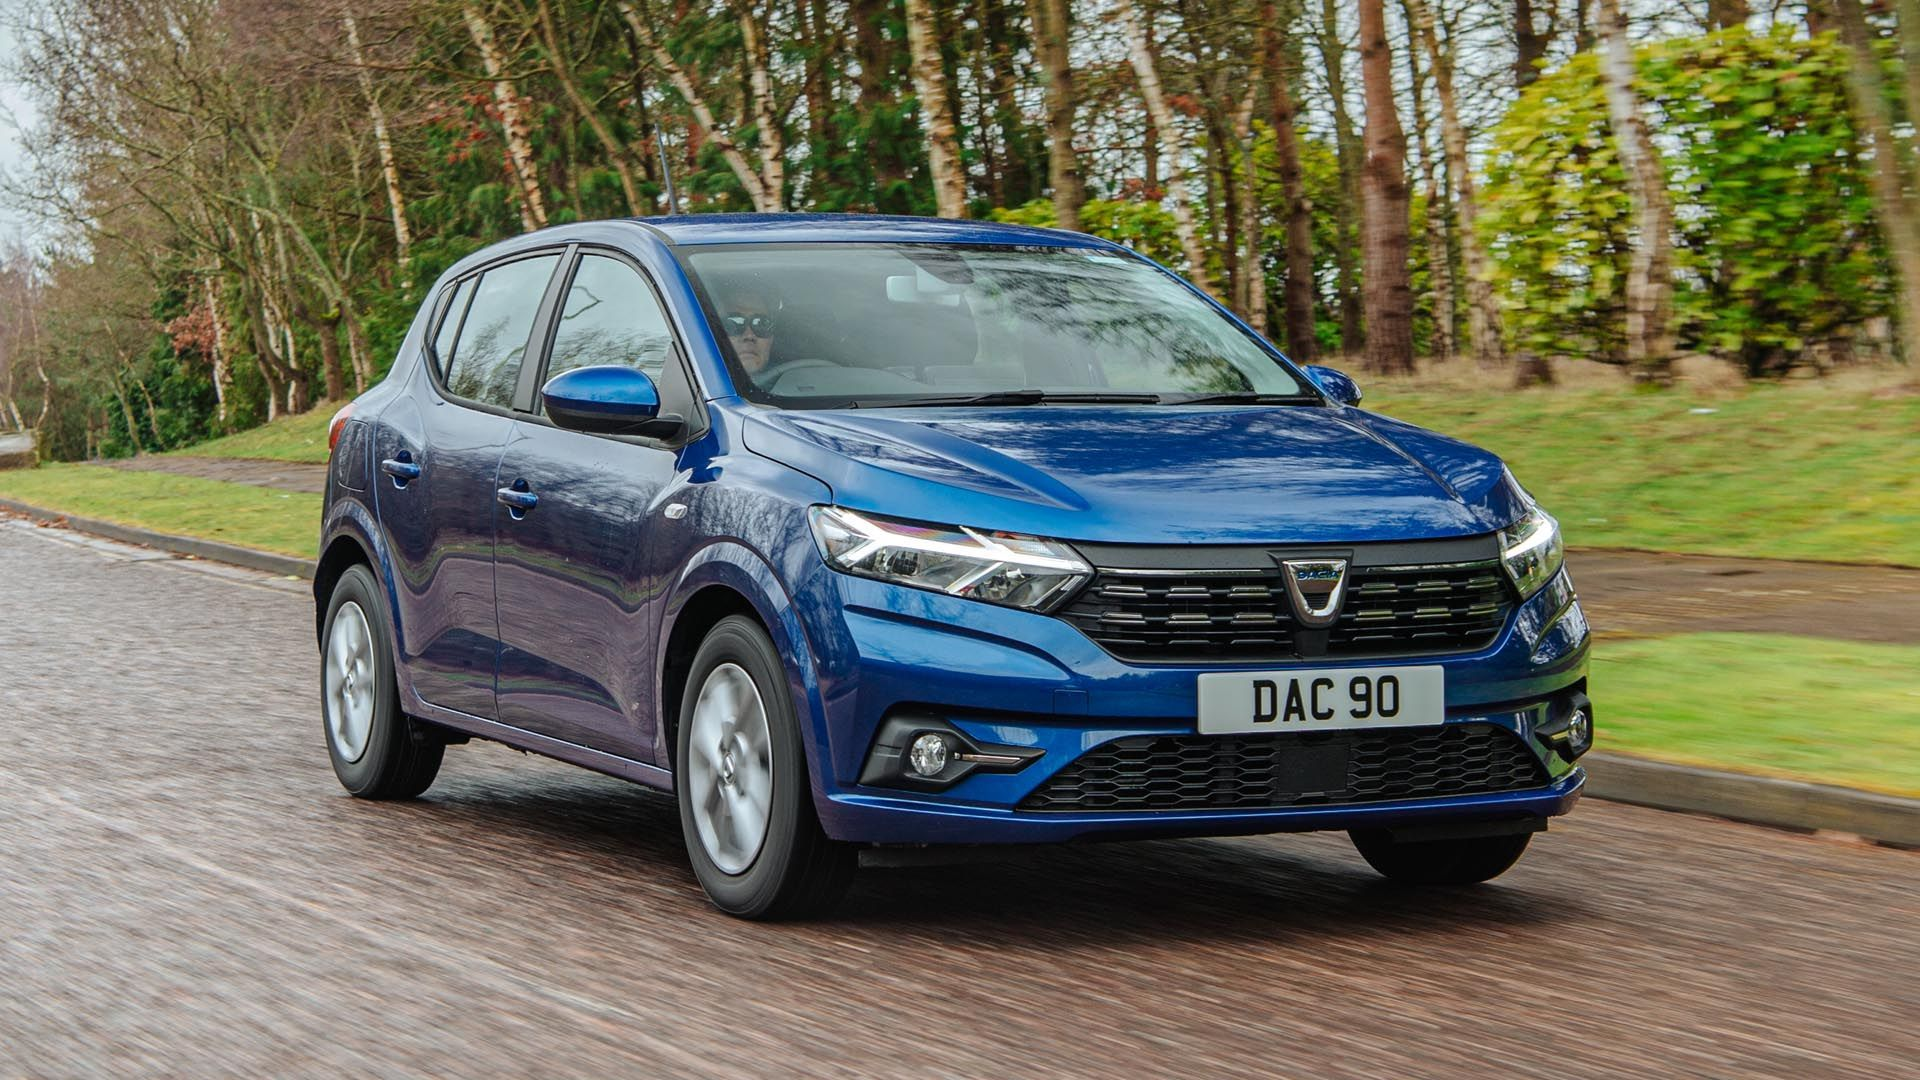 Dacia   image